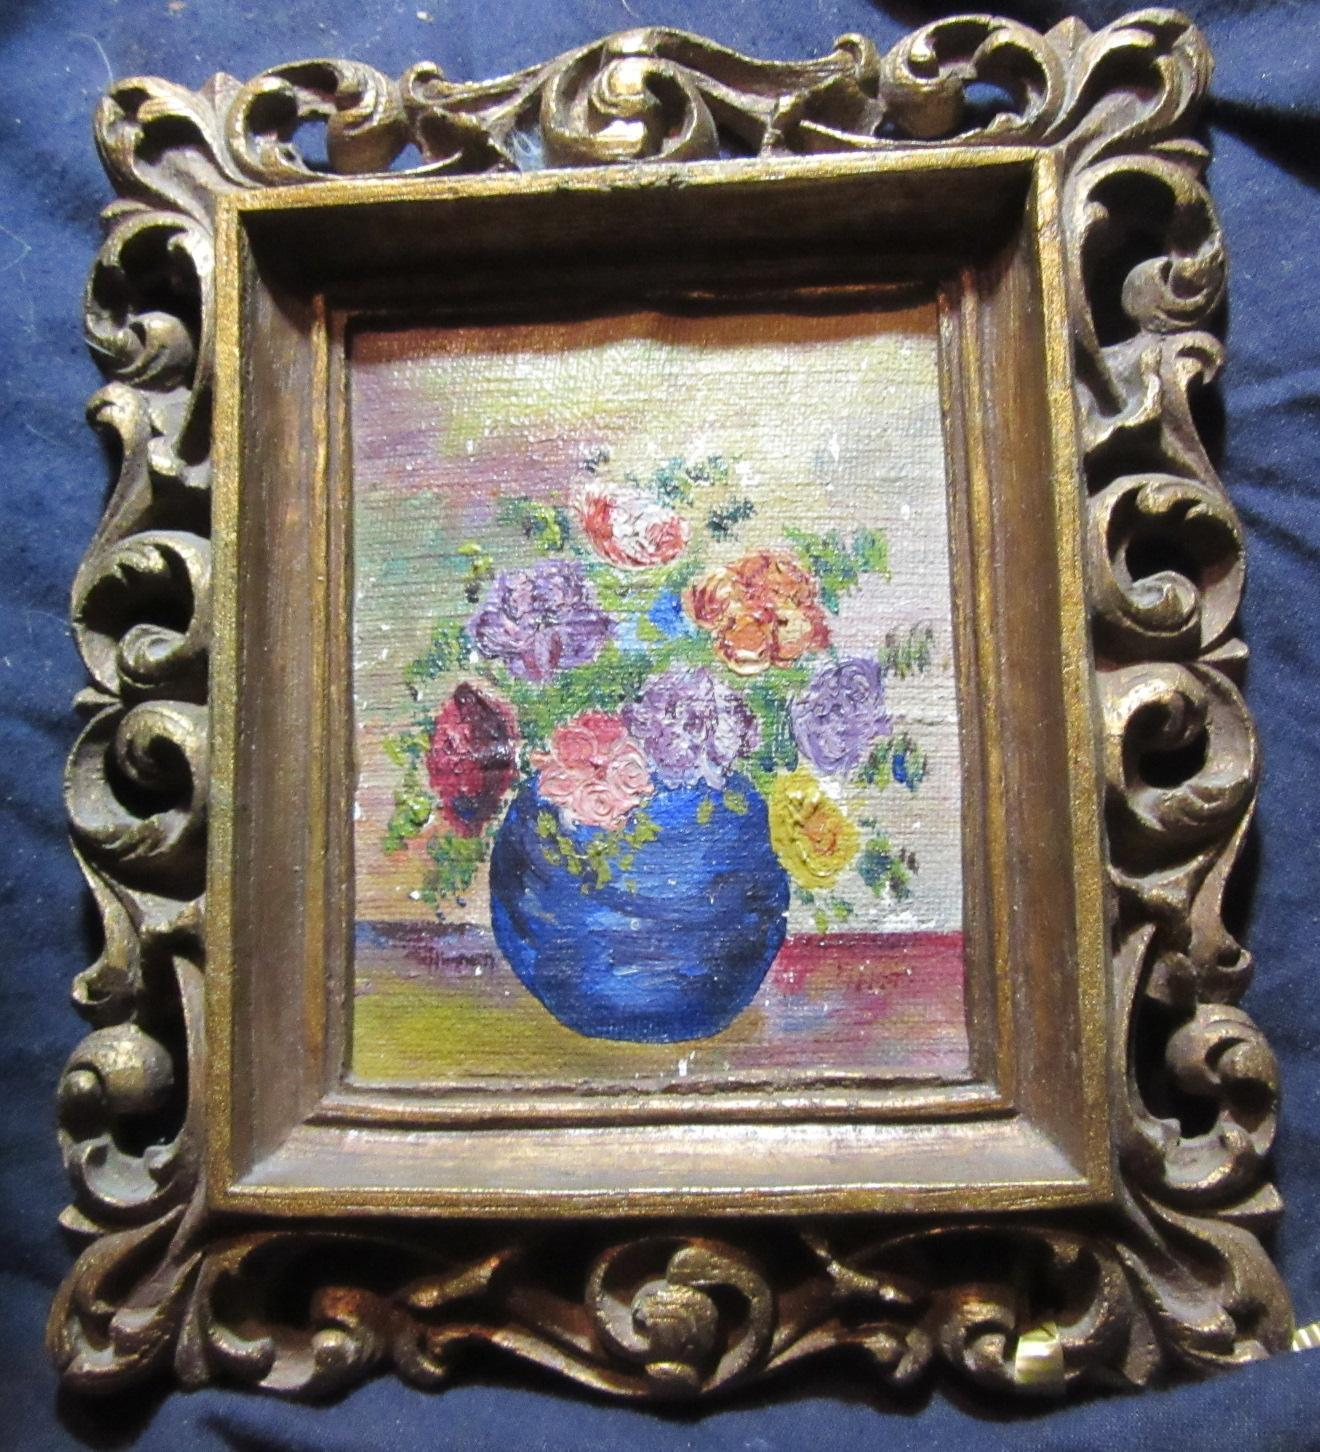 Miniature Painting Vase With Flowers Original Art